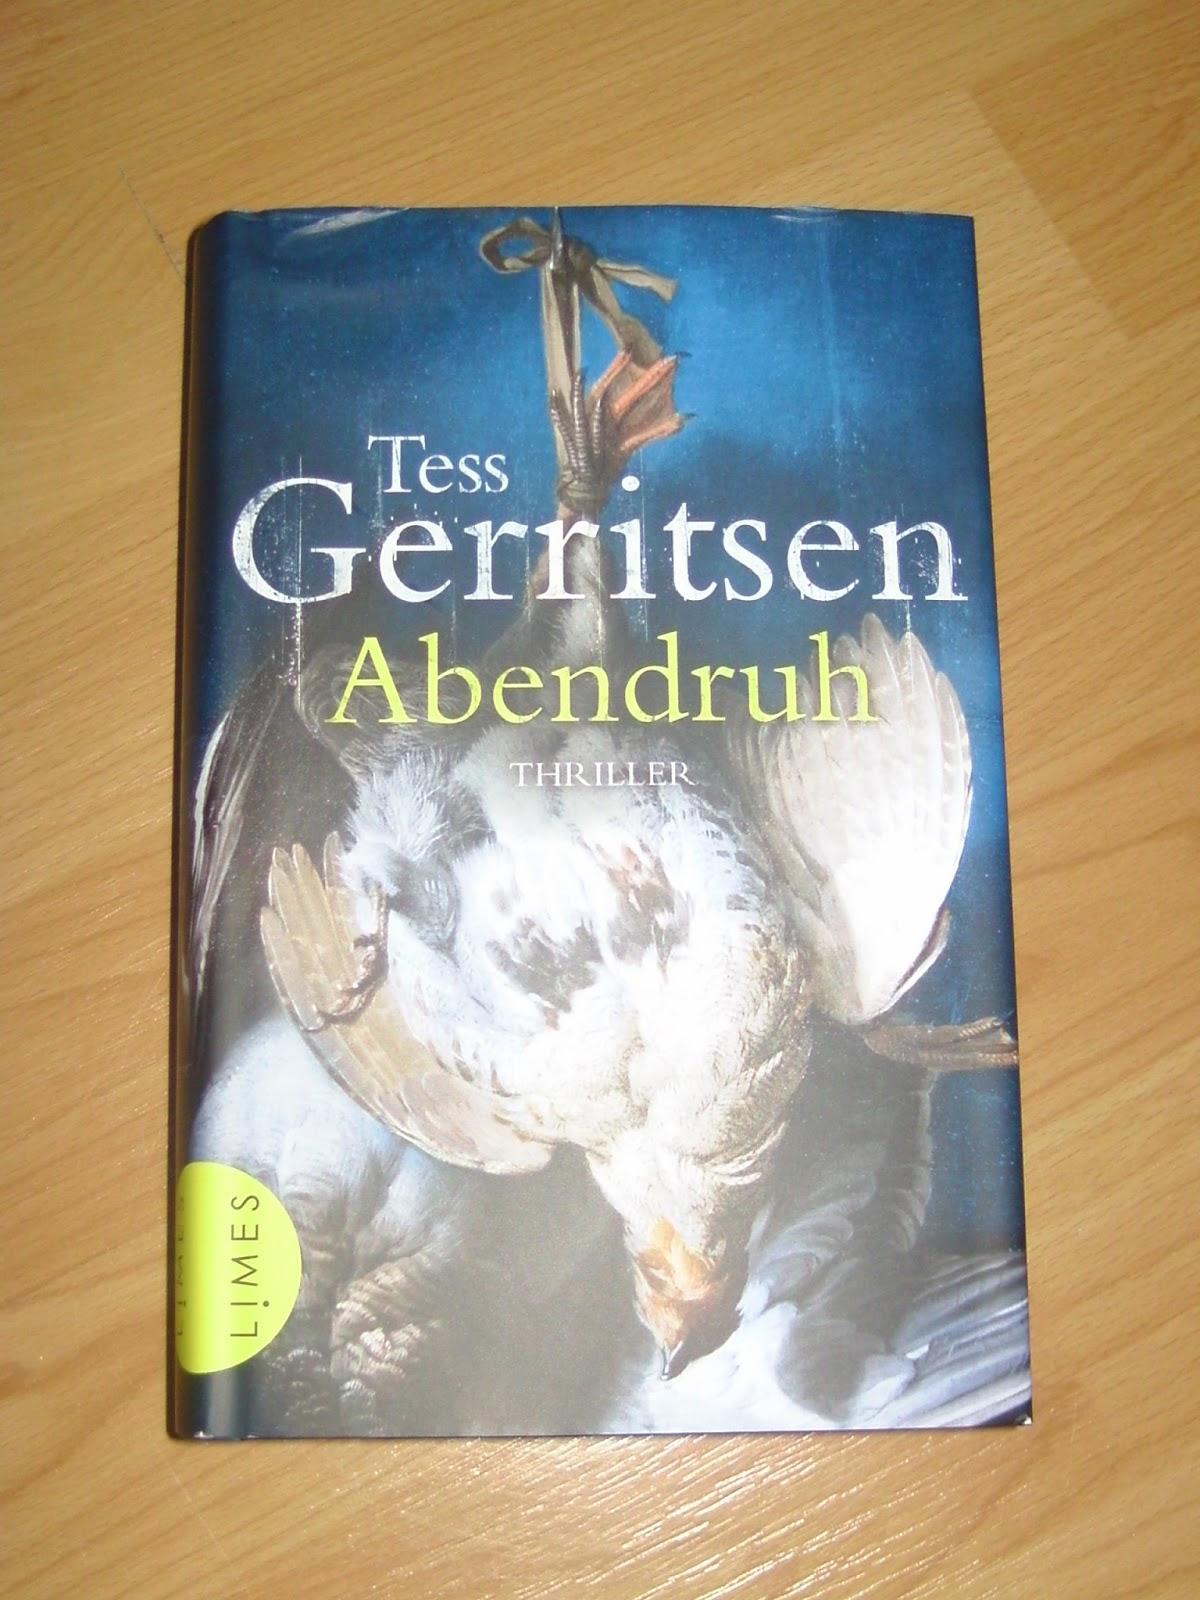 http://steffis-und-heikes-lesezauber.blogspot.de/2013/05/rezension-abendruh-tess-gerritsen.html